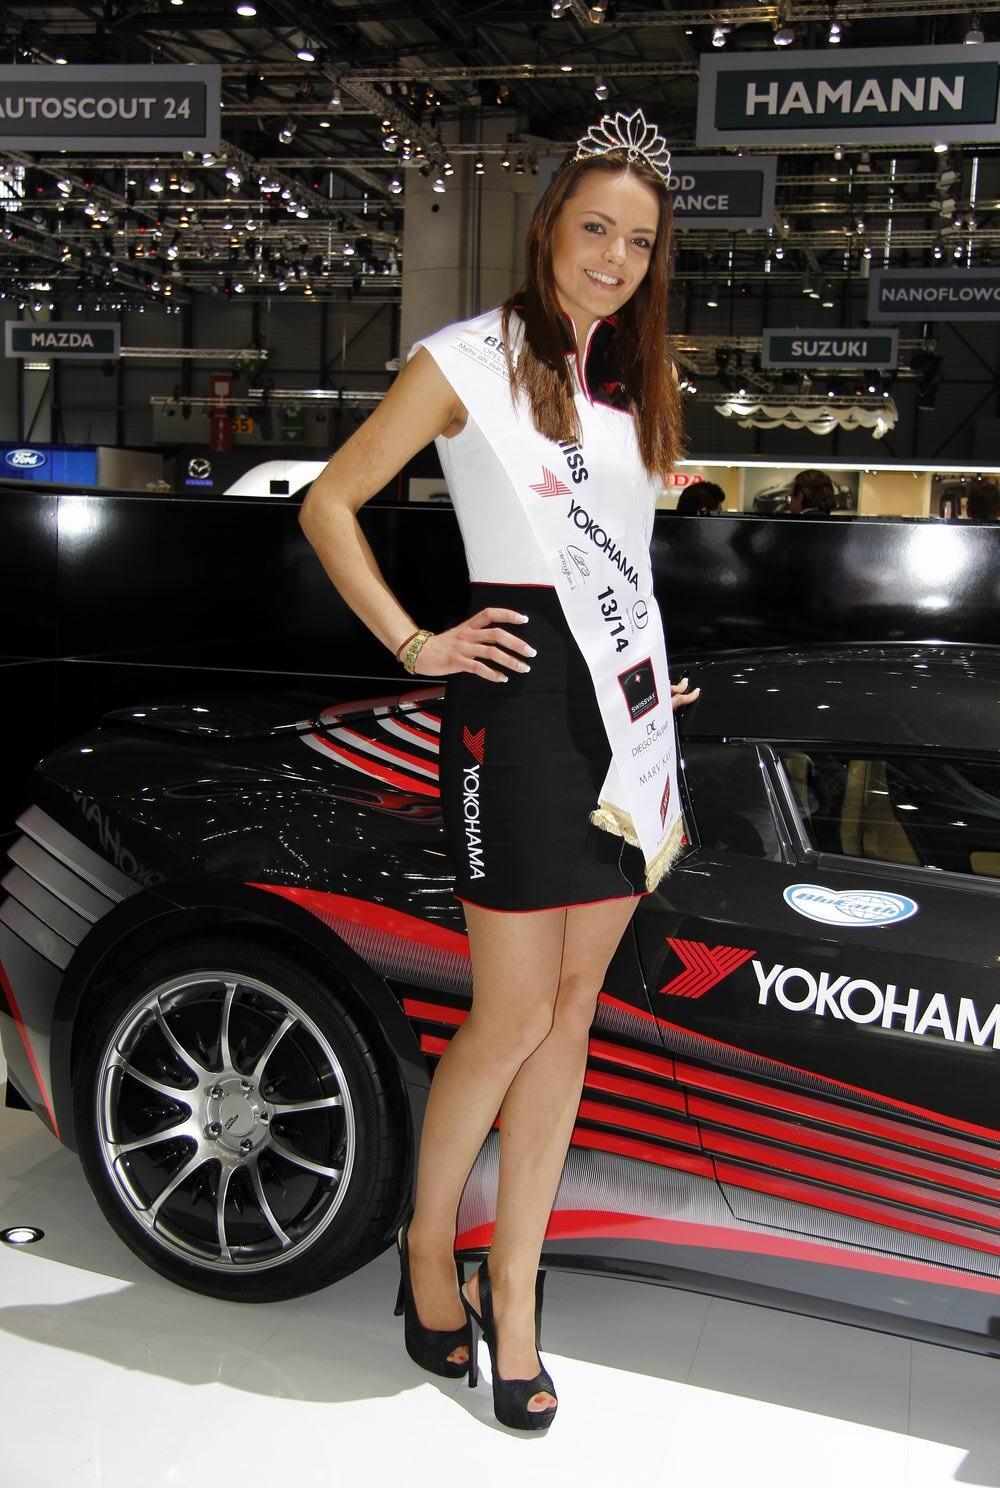 Elisez Miss Genve 2014  10 htesses  dpartager